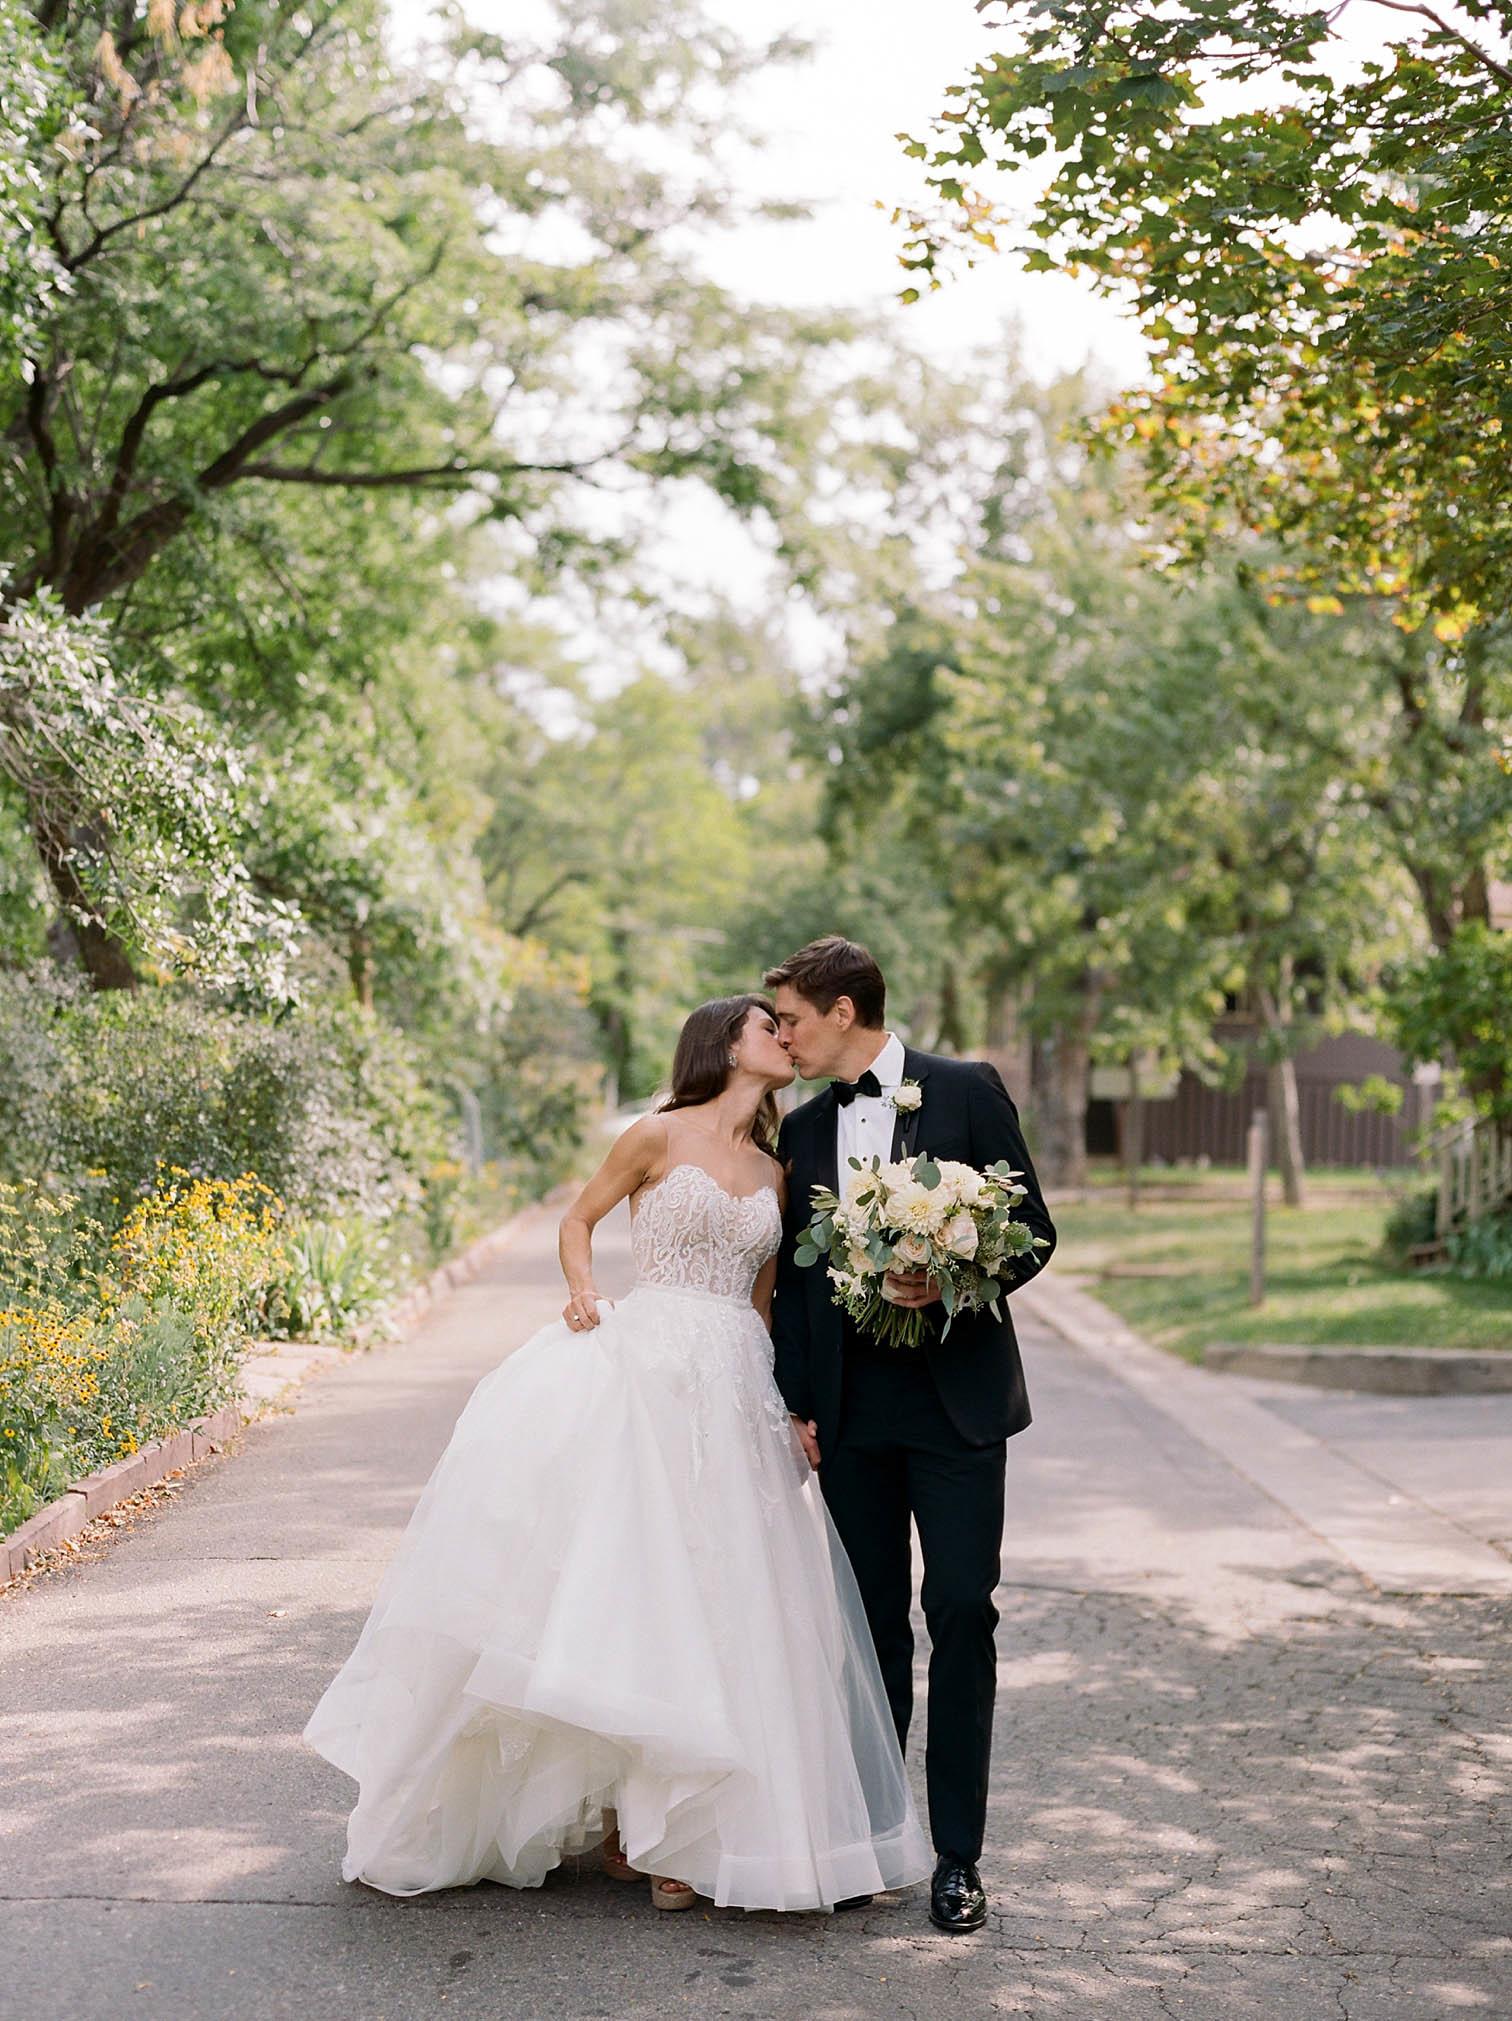 Classic Romantic Black Tie Wedding in Boulder, Colorado - Danielle DeFiore Photography